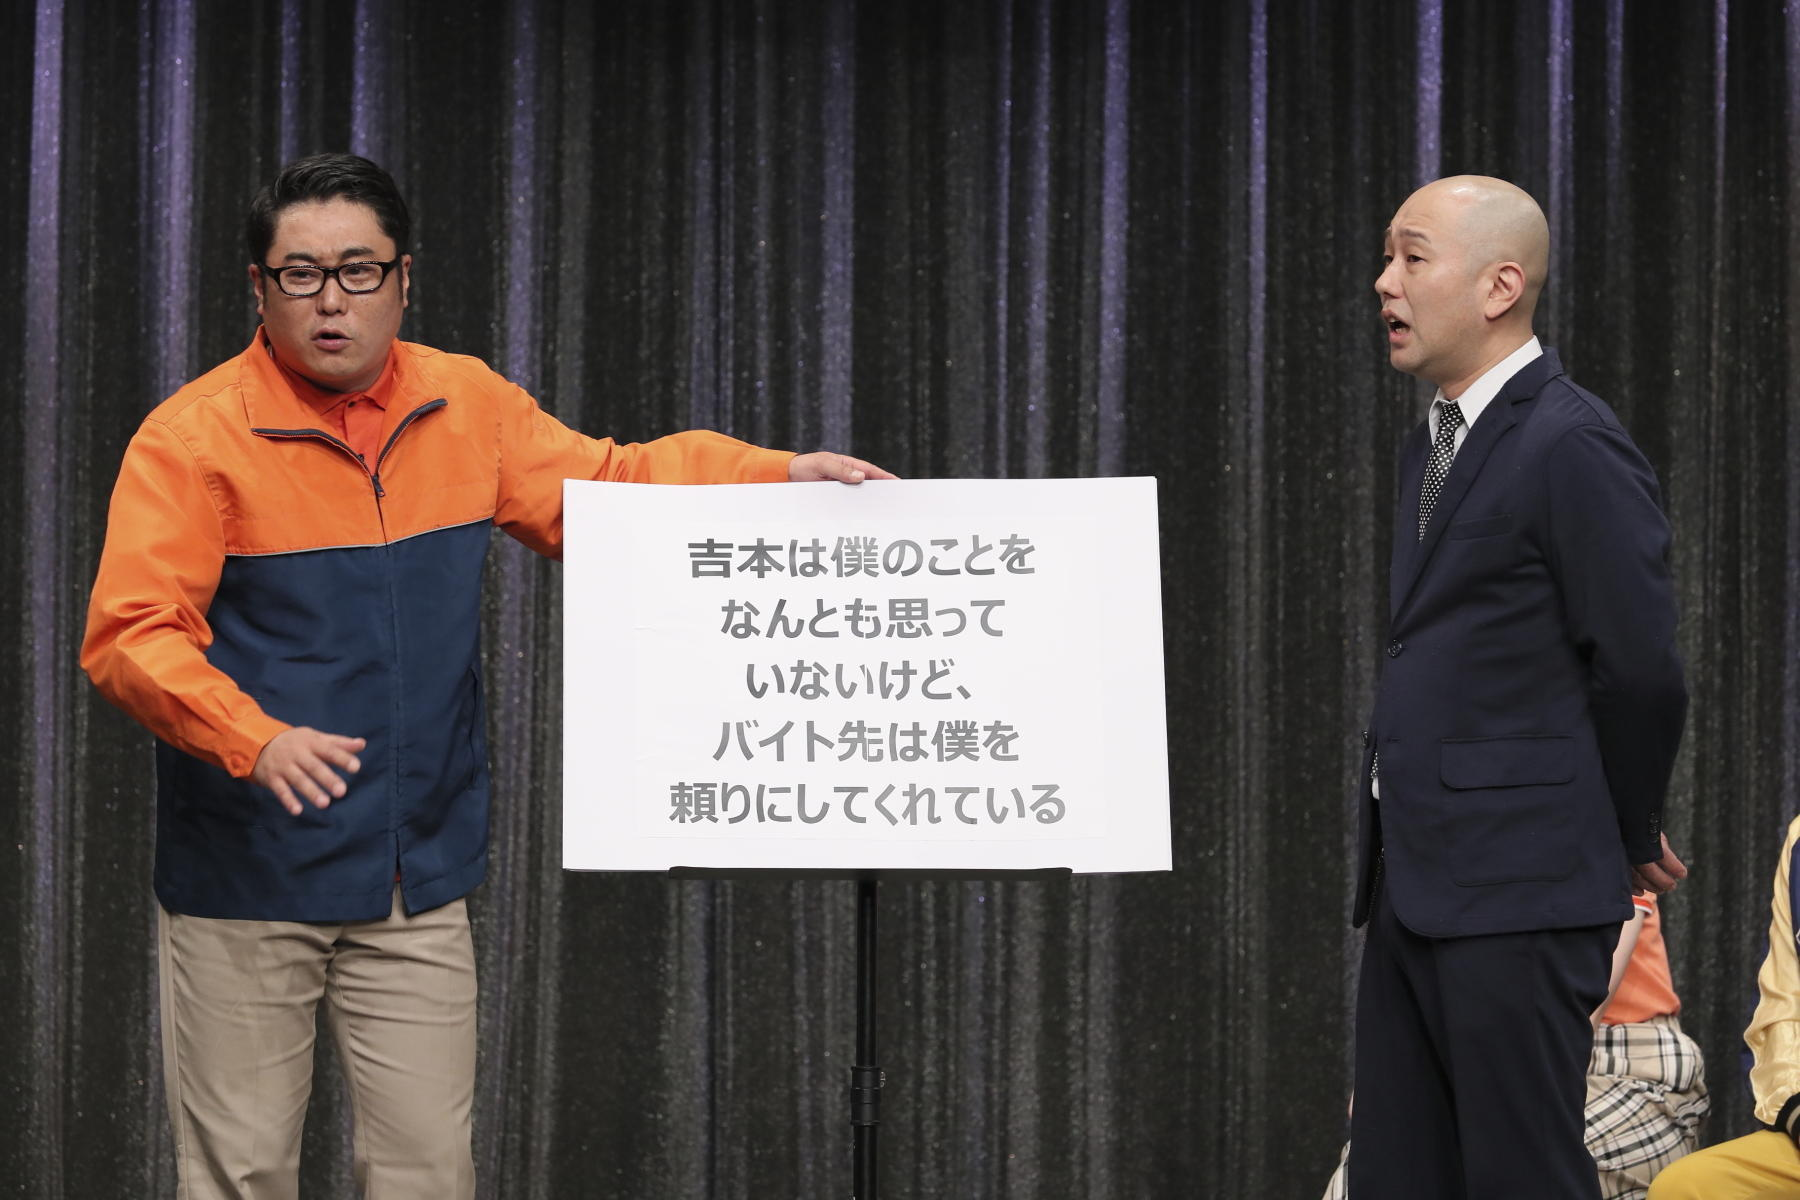 http://news.yoshimoto.co.jp/20180613165247-1699badb88e04da967469a59484443d37126e952.jpg